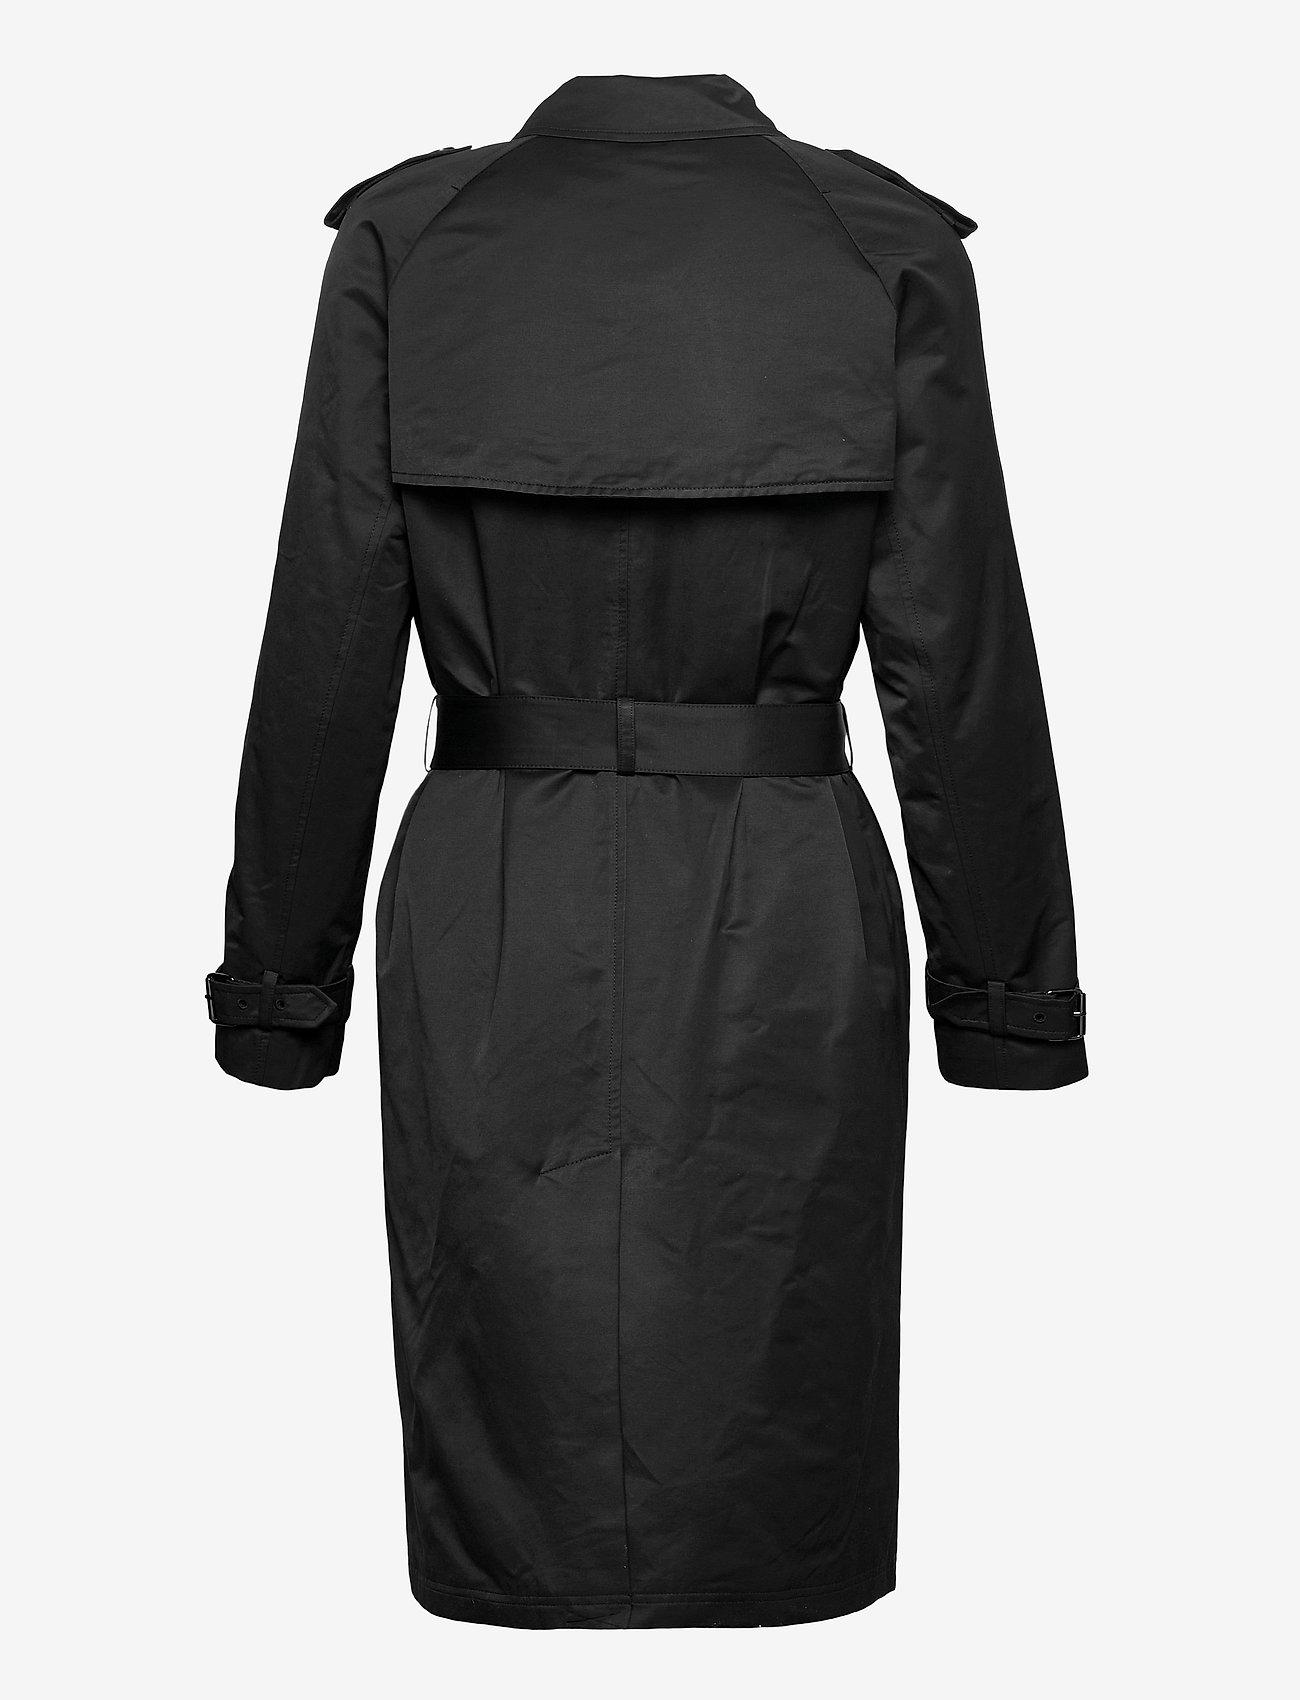 Calvin Klein - COTTON NYLON TRENCH COAT - trenchcoats - ck black - 1